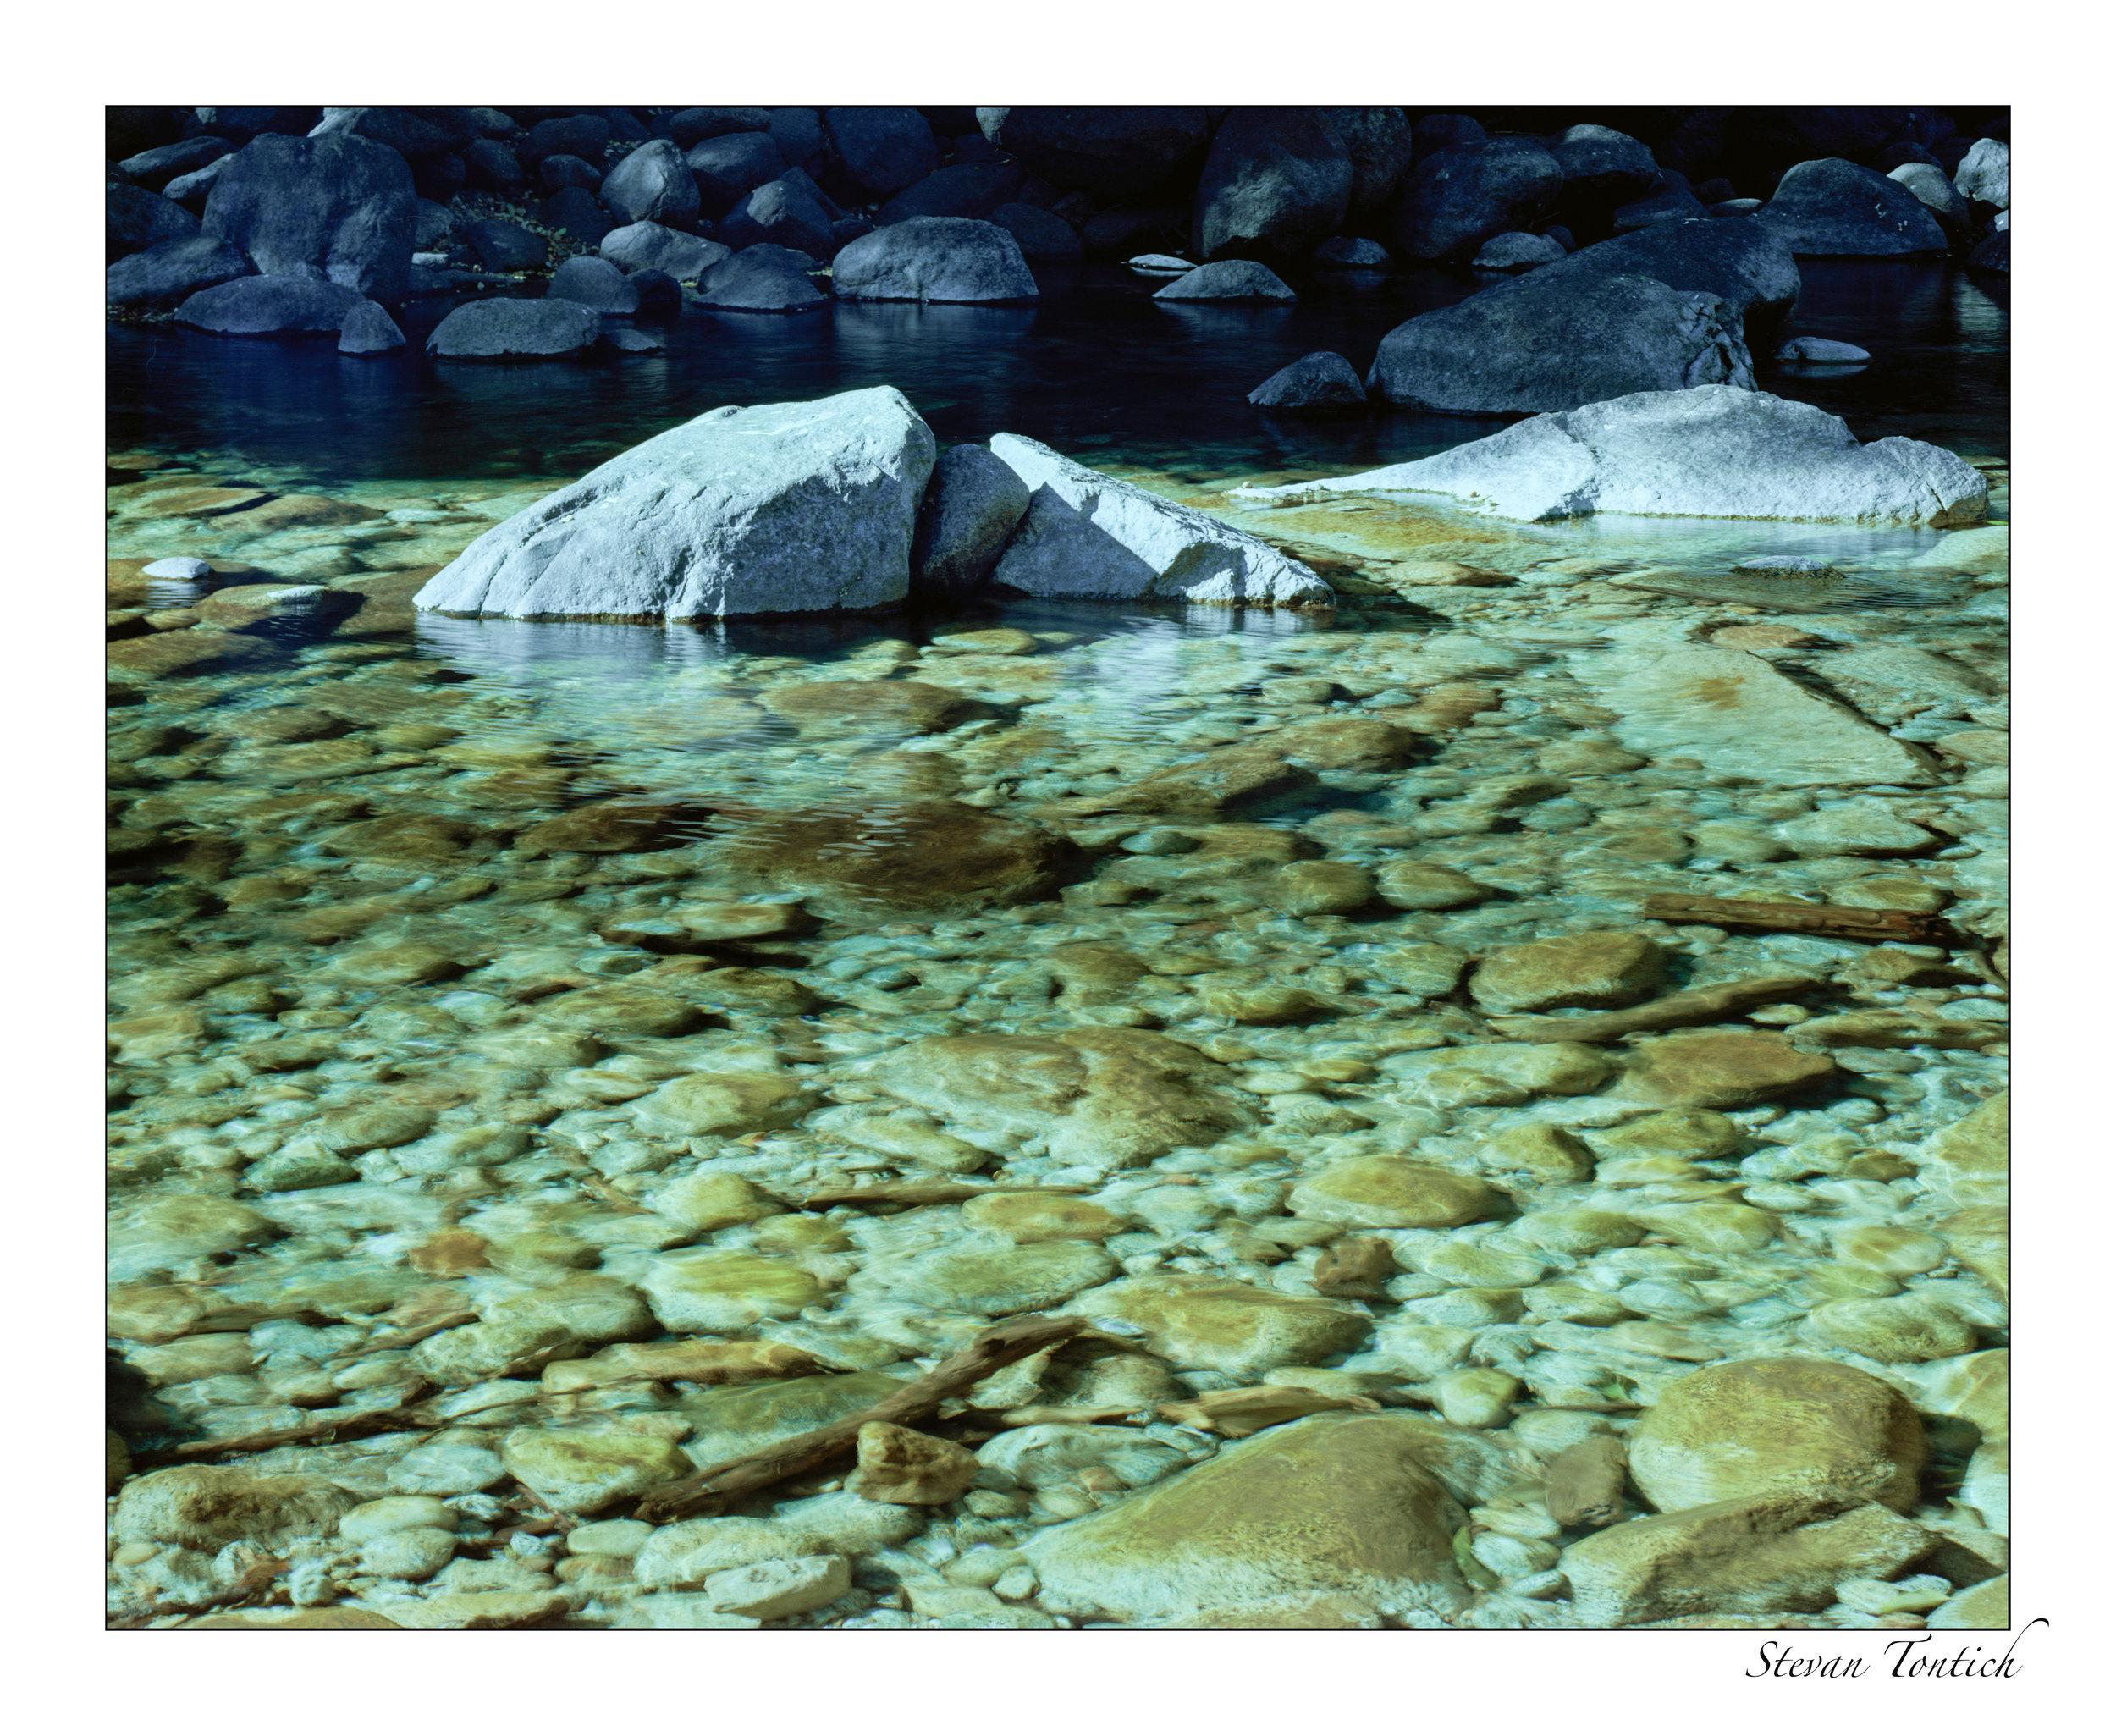 Yosemite cl-0006.jpg